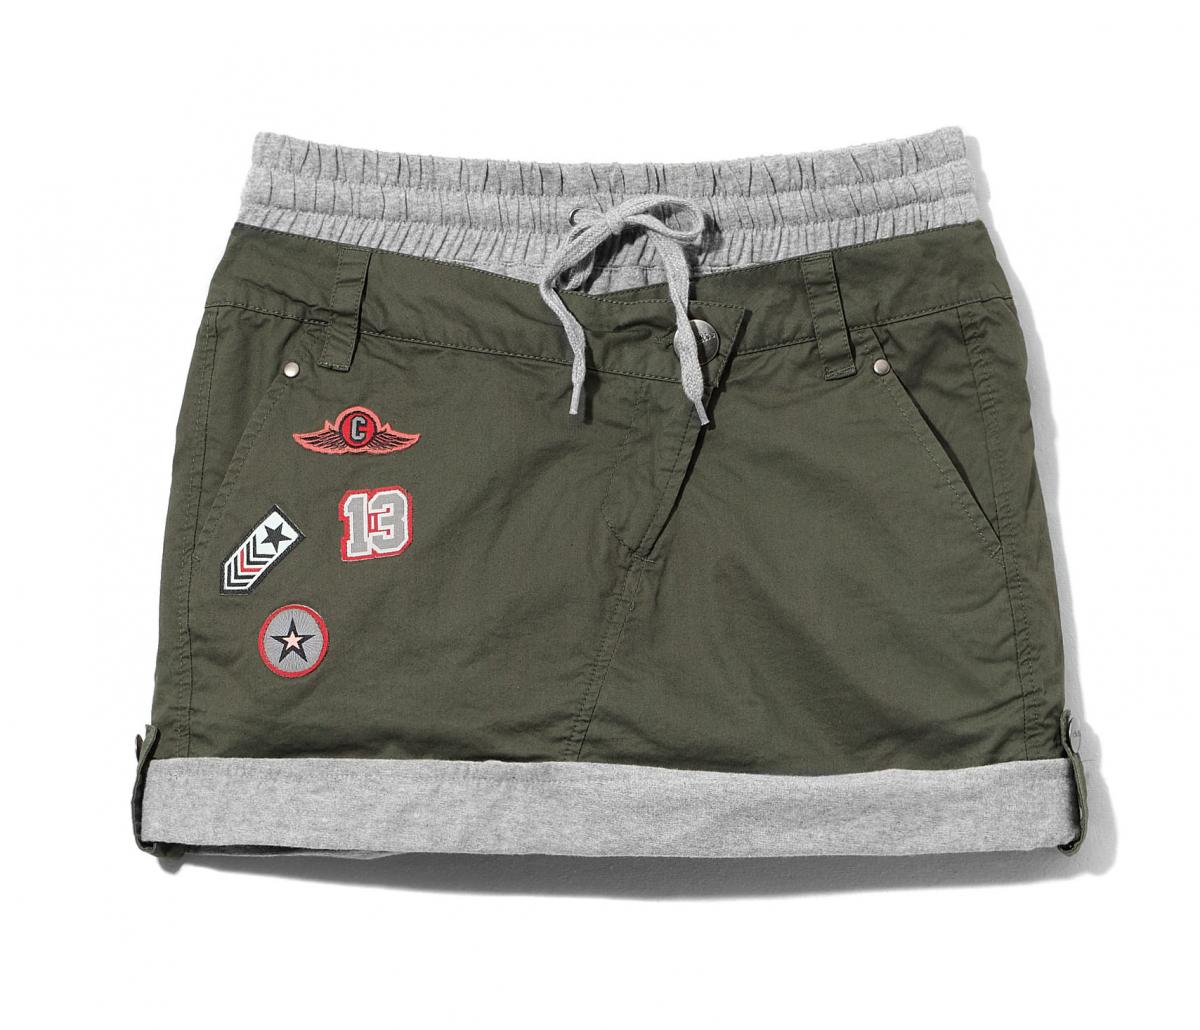 khaki spódnica Cropp - wiosna 2011